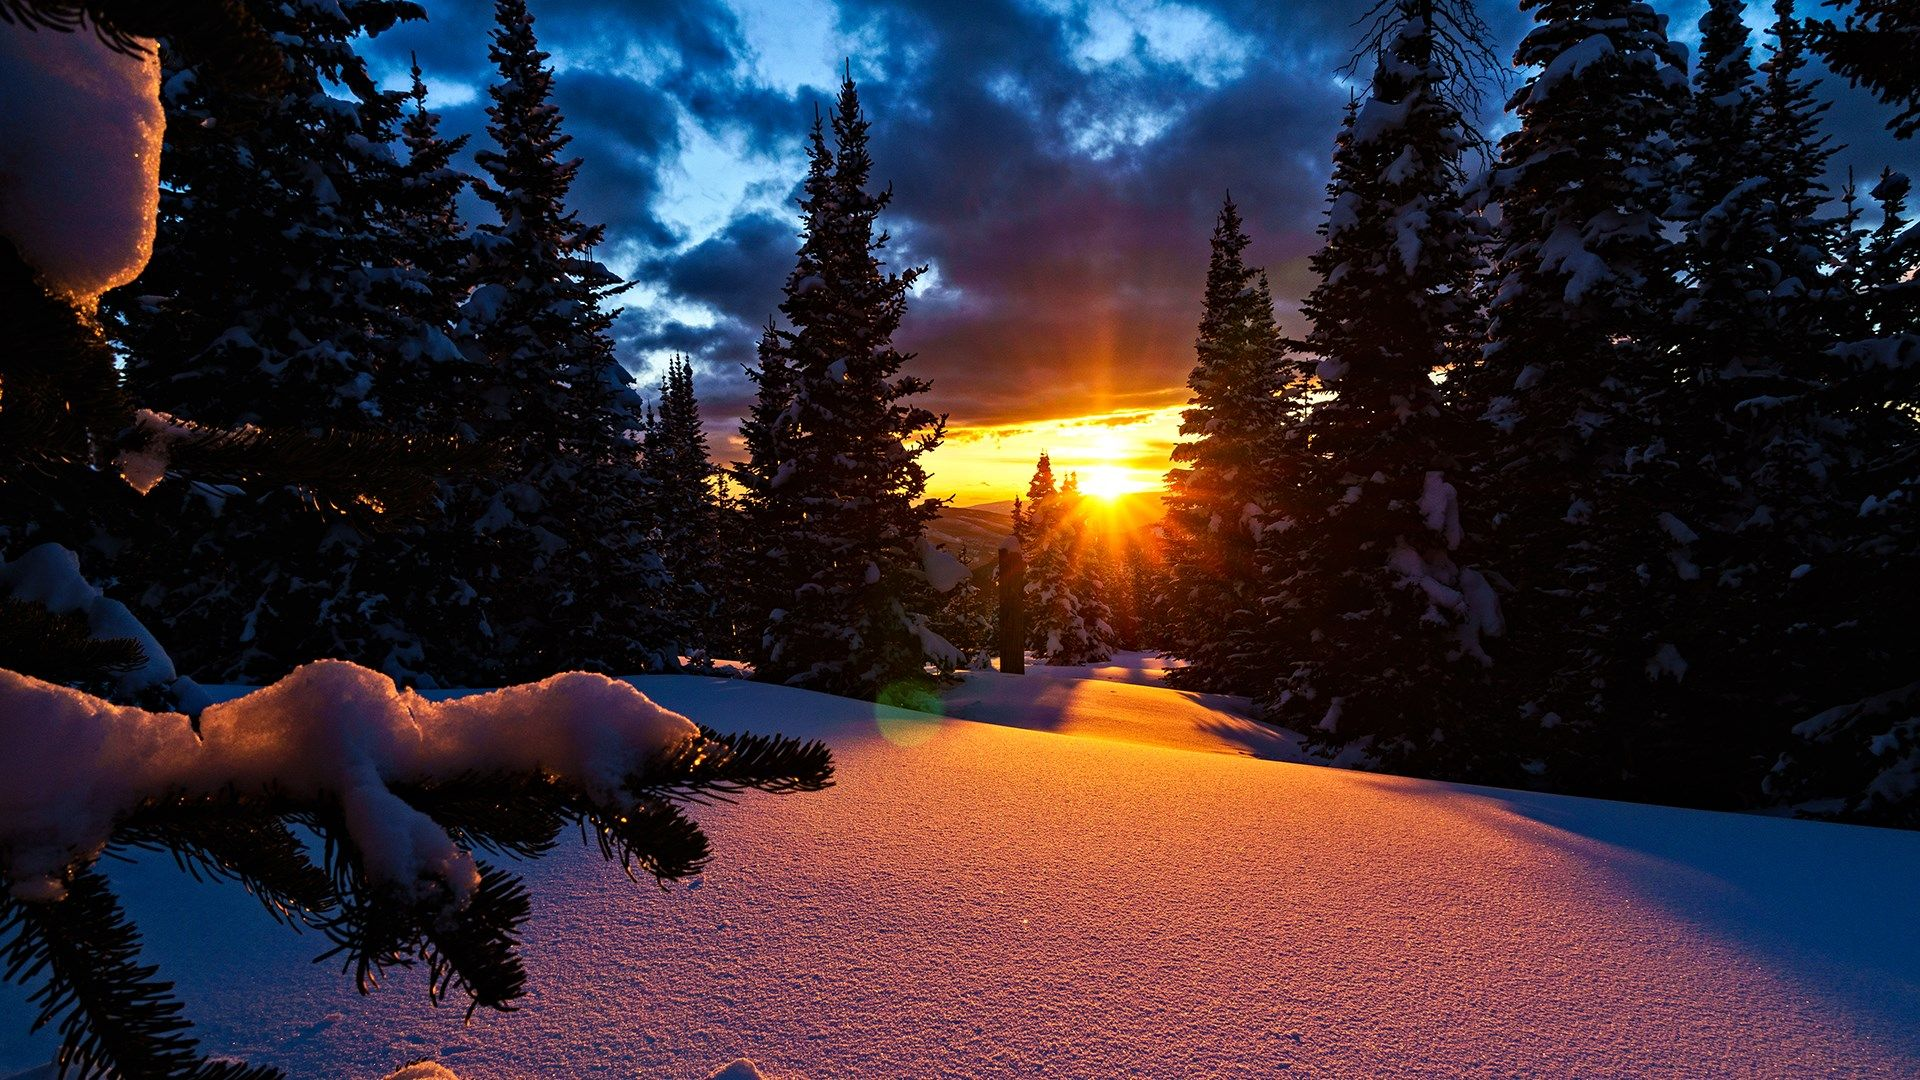 Clouds Windows 10 Spotlight Images Part 29 Colorado Image Lake Places To Go